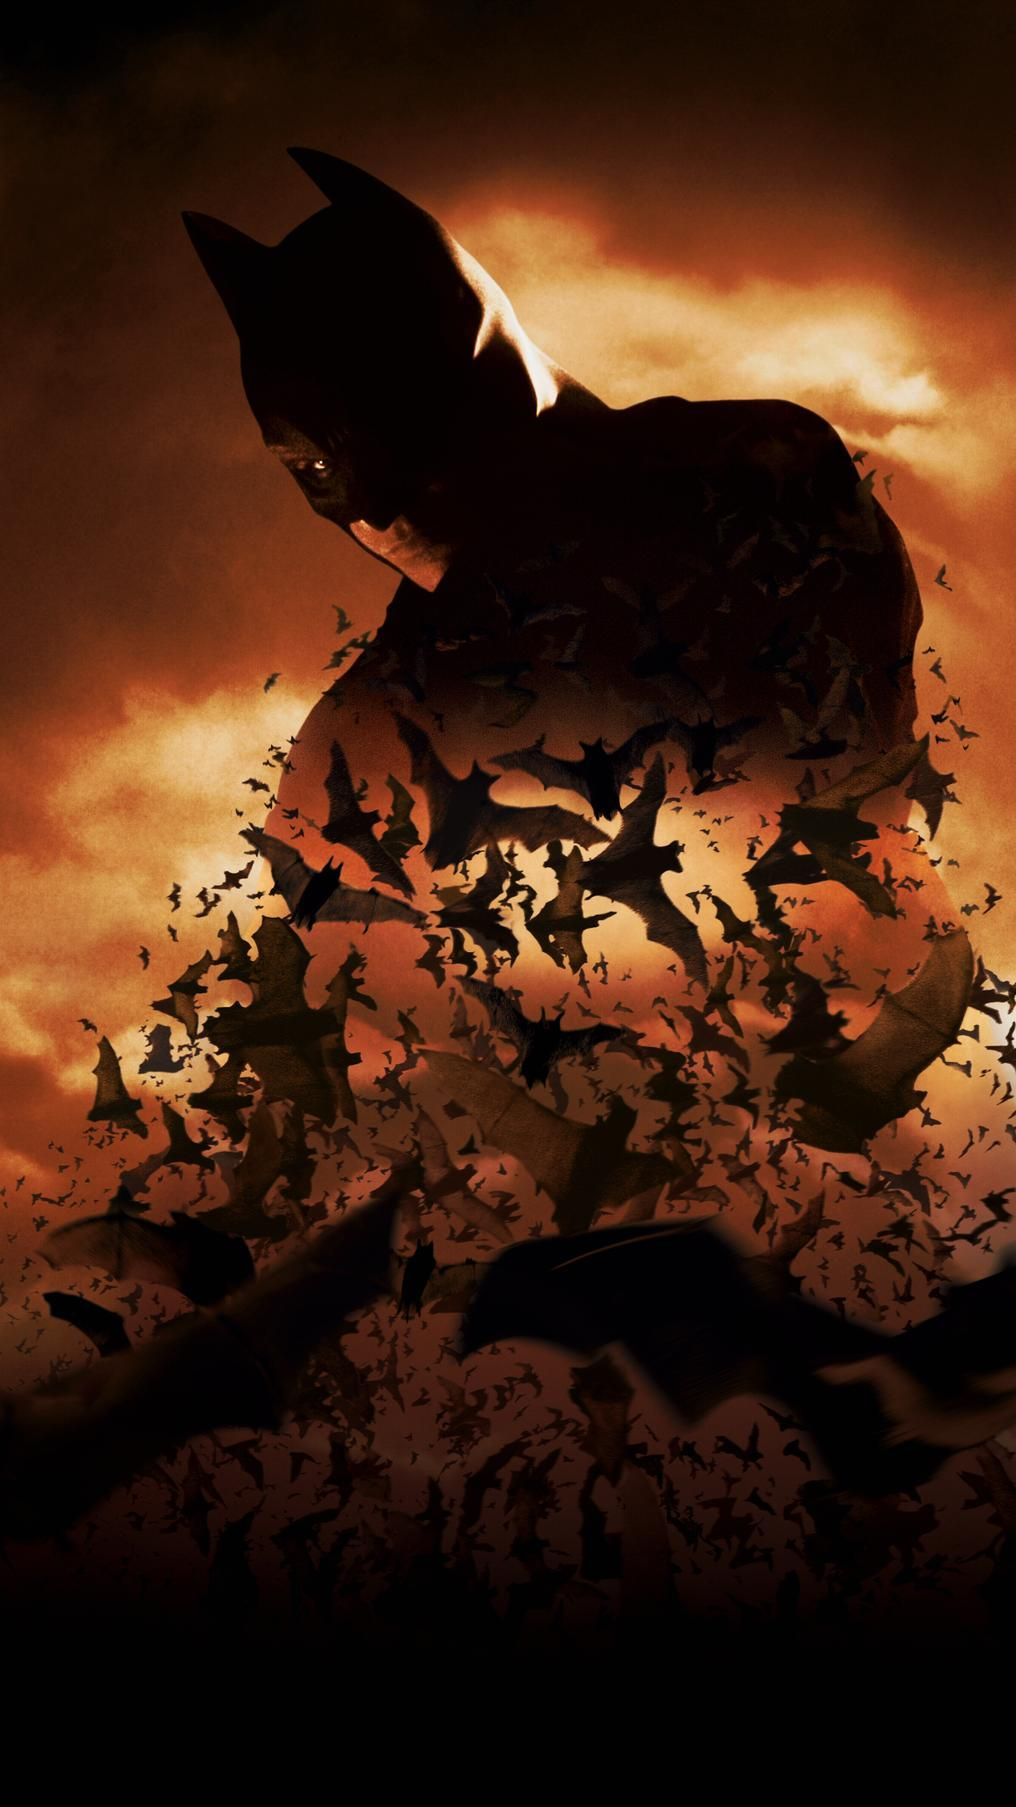 Batman Begins 2005 Phone Wallpaper Batman Peliculas